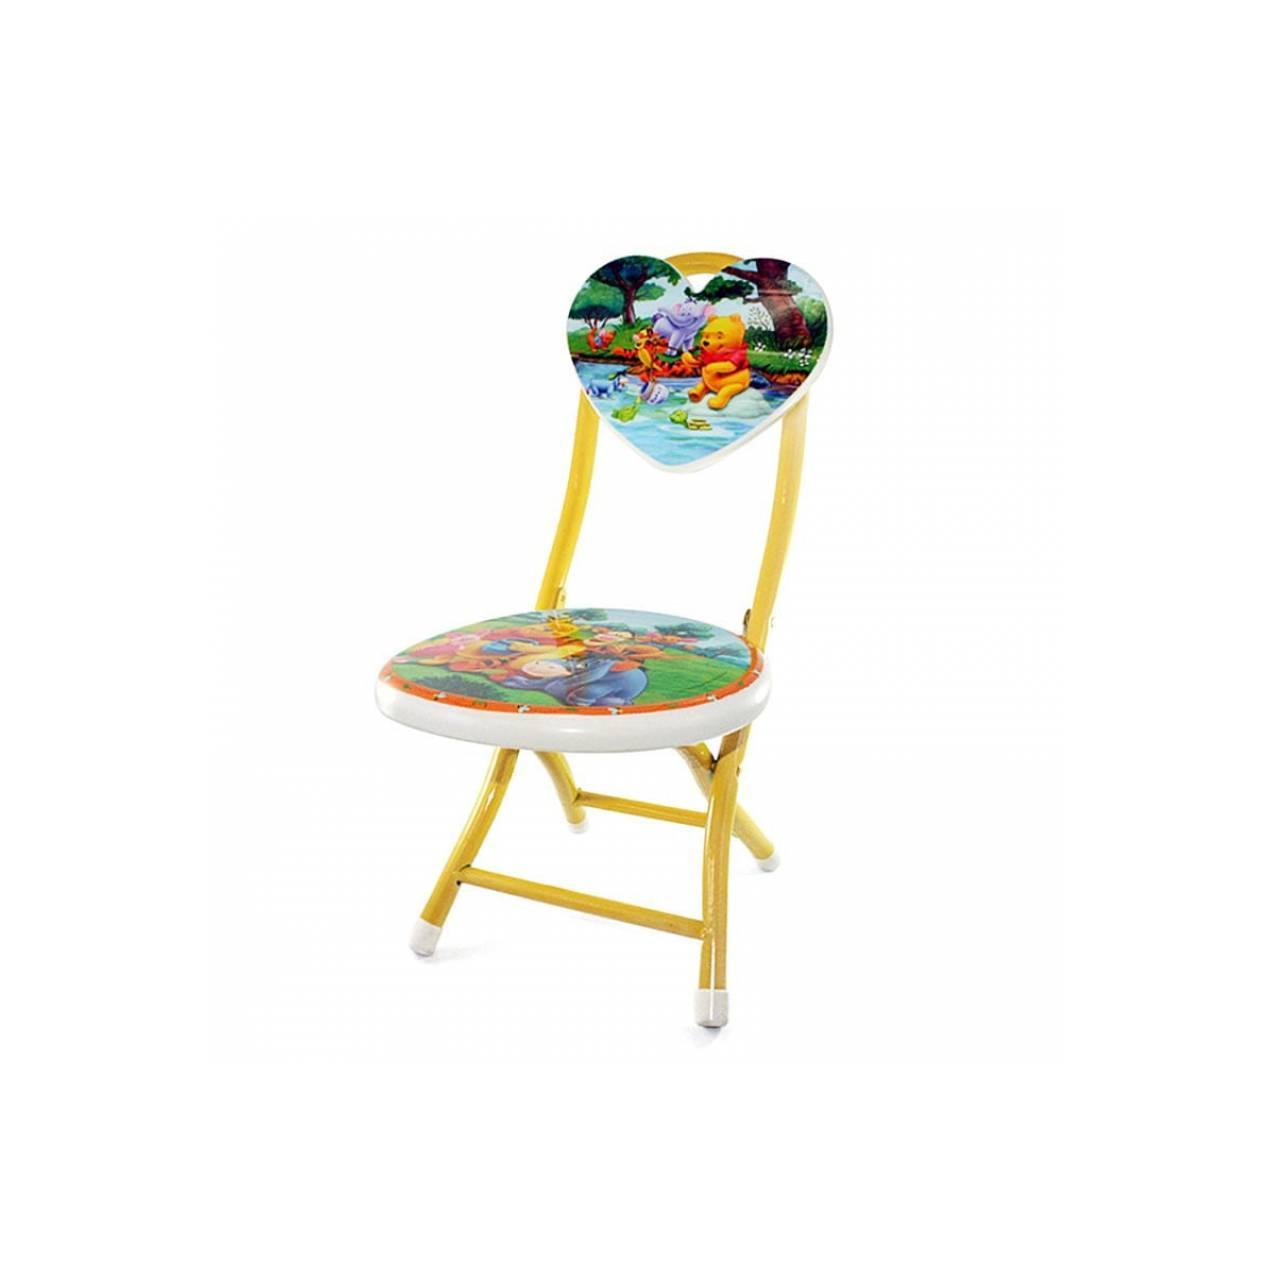 OHOME Kursi Lipat Besi ZZ-MS Stool Folding Chair - Winnie the Pooh